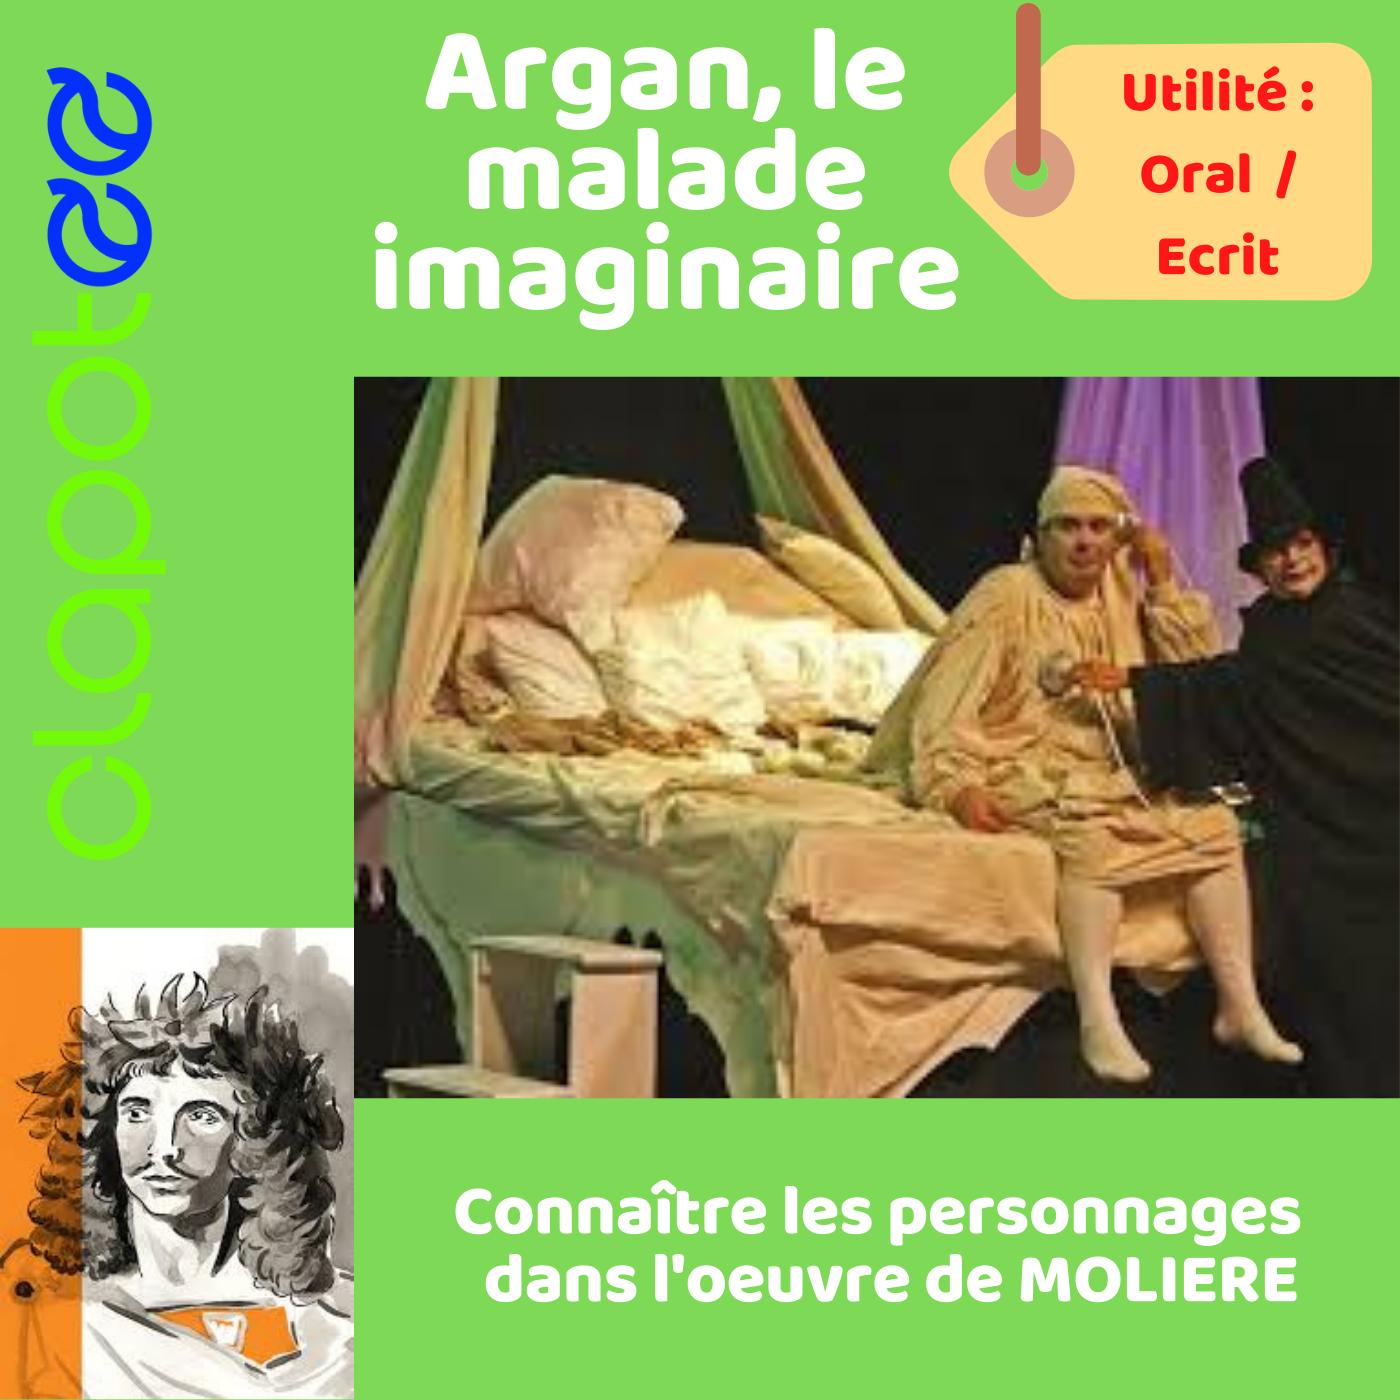 ARGAN, le Malade Imaginaire de MOLIERE.